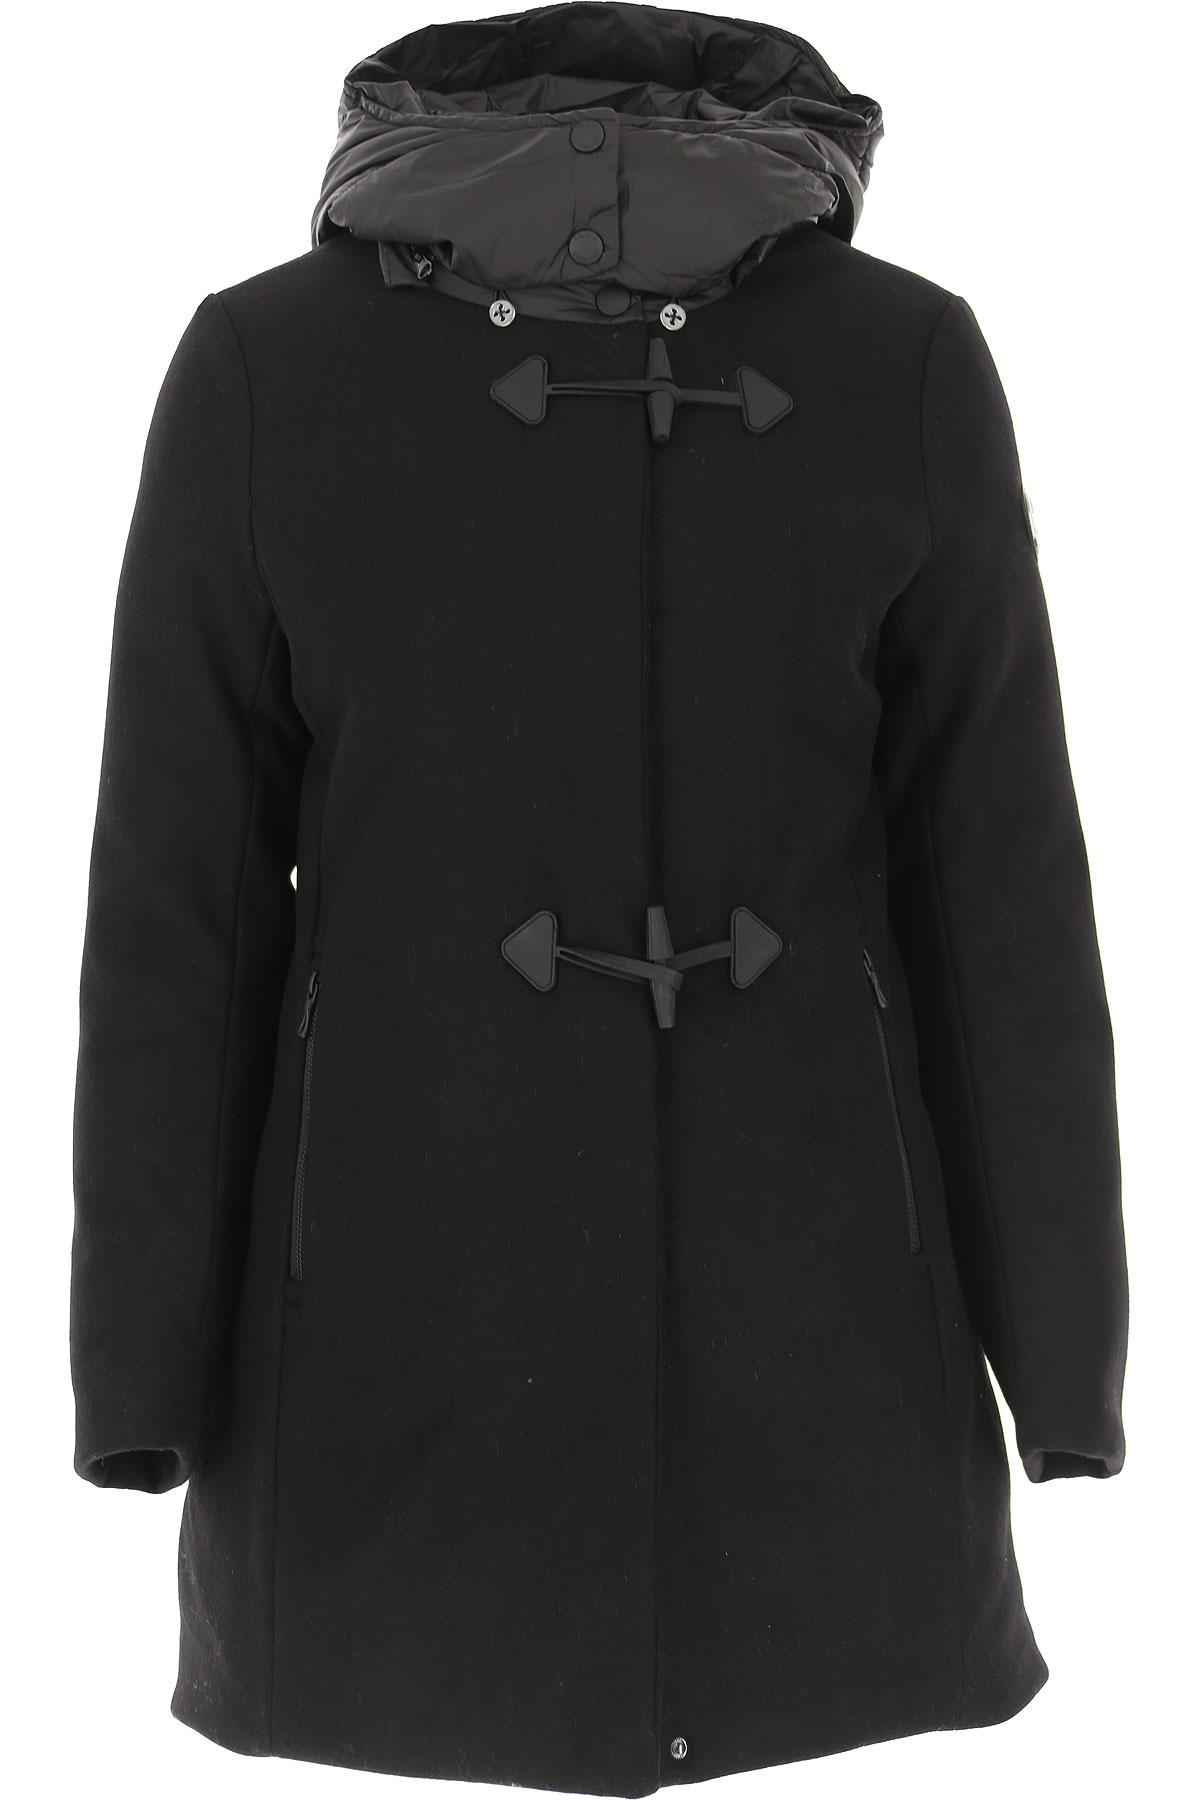 Colmar Down Jacket for Women, Puffer Ski Jacket On Sale, Black, polyamide, 2019, 2 4 6 8